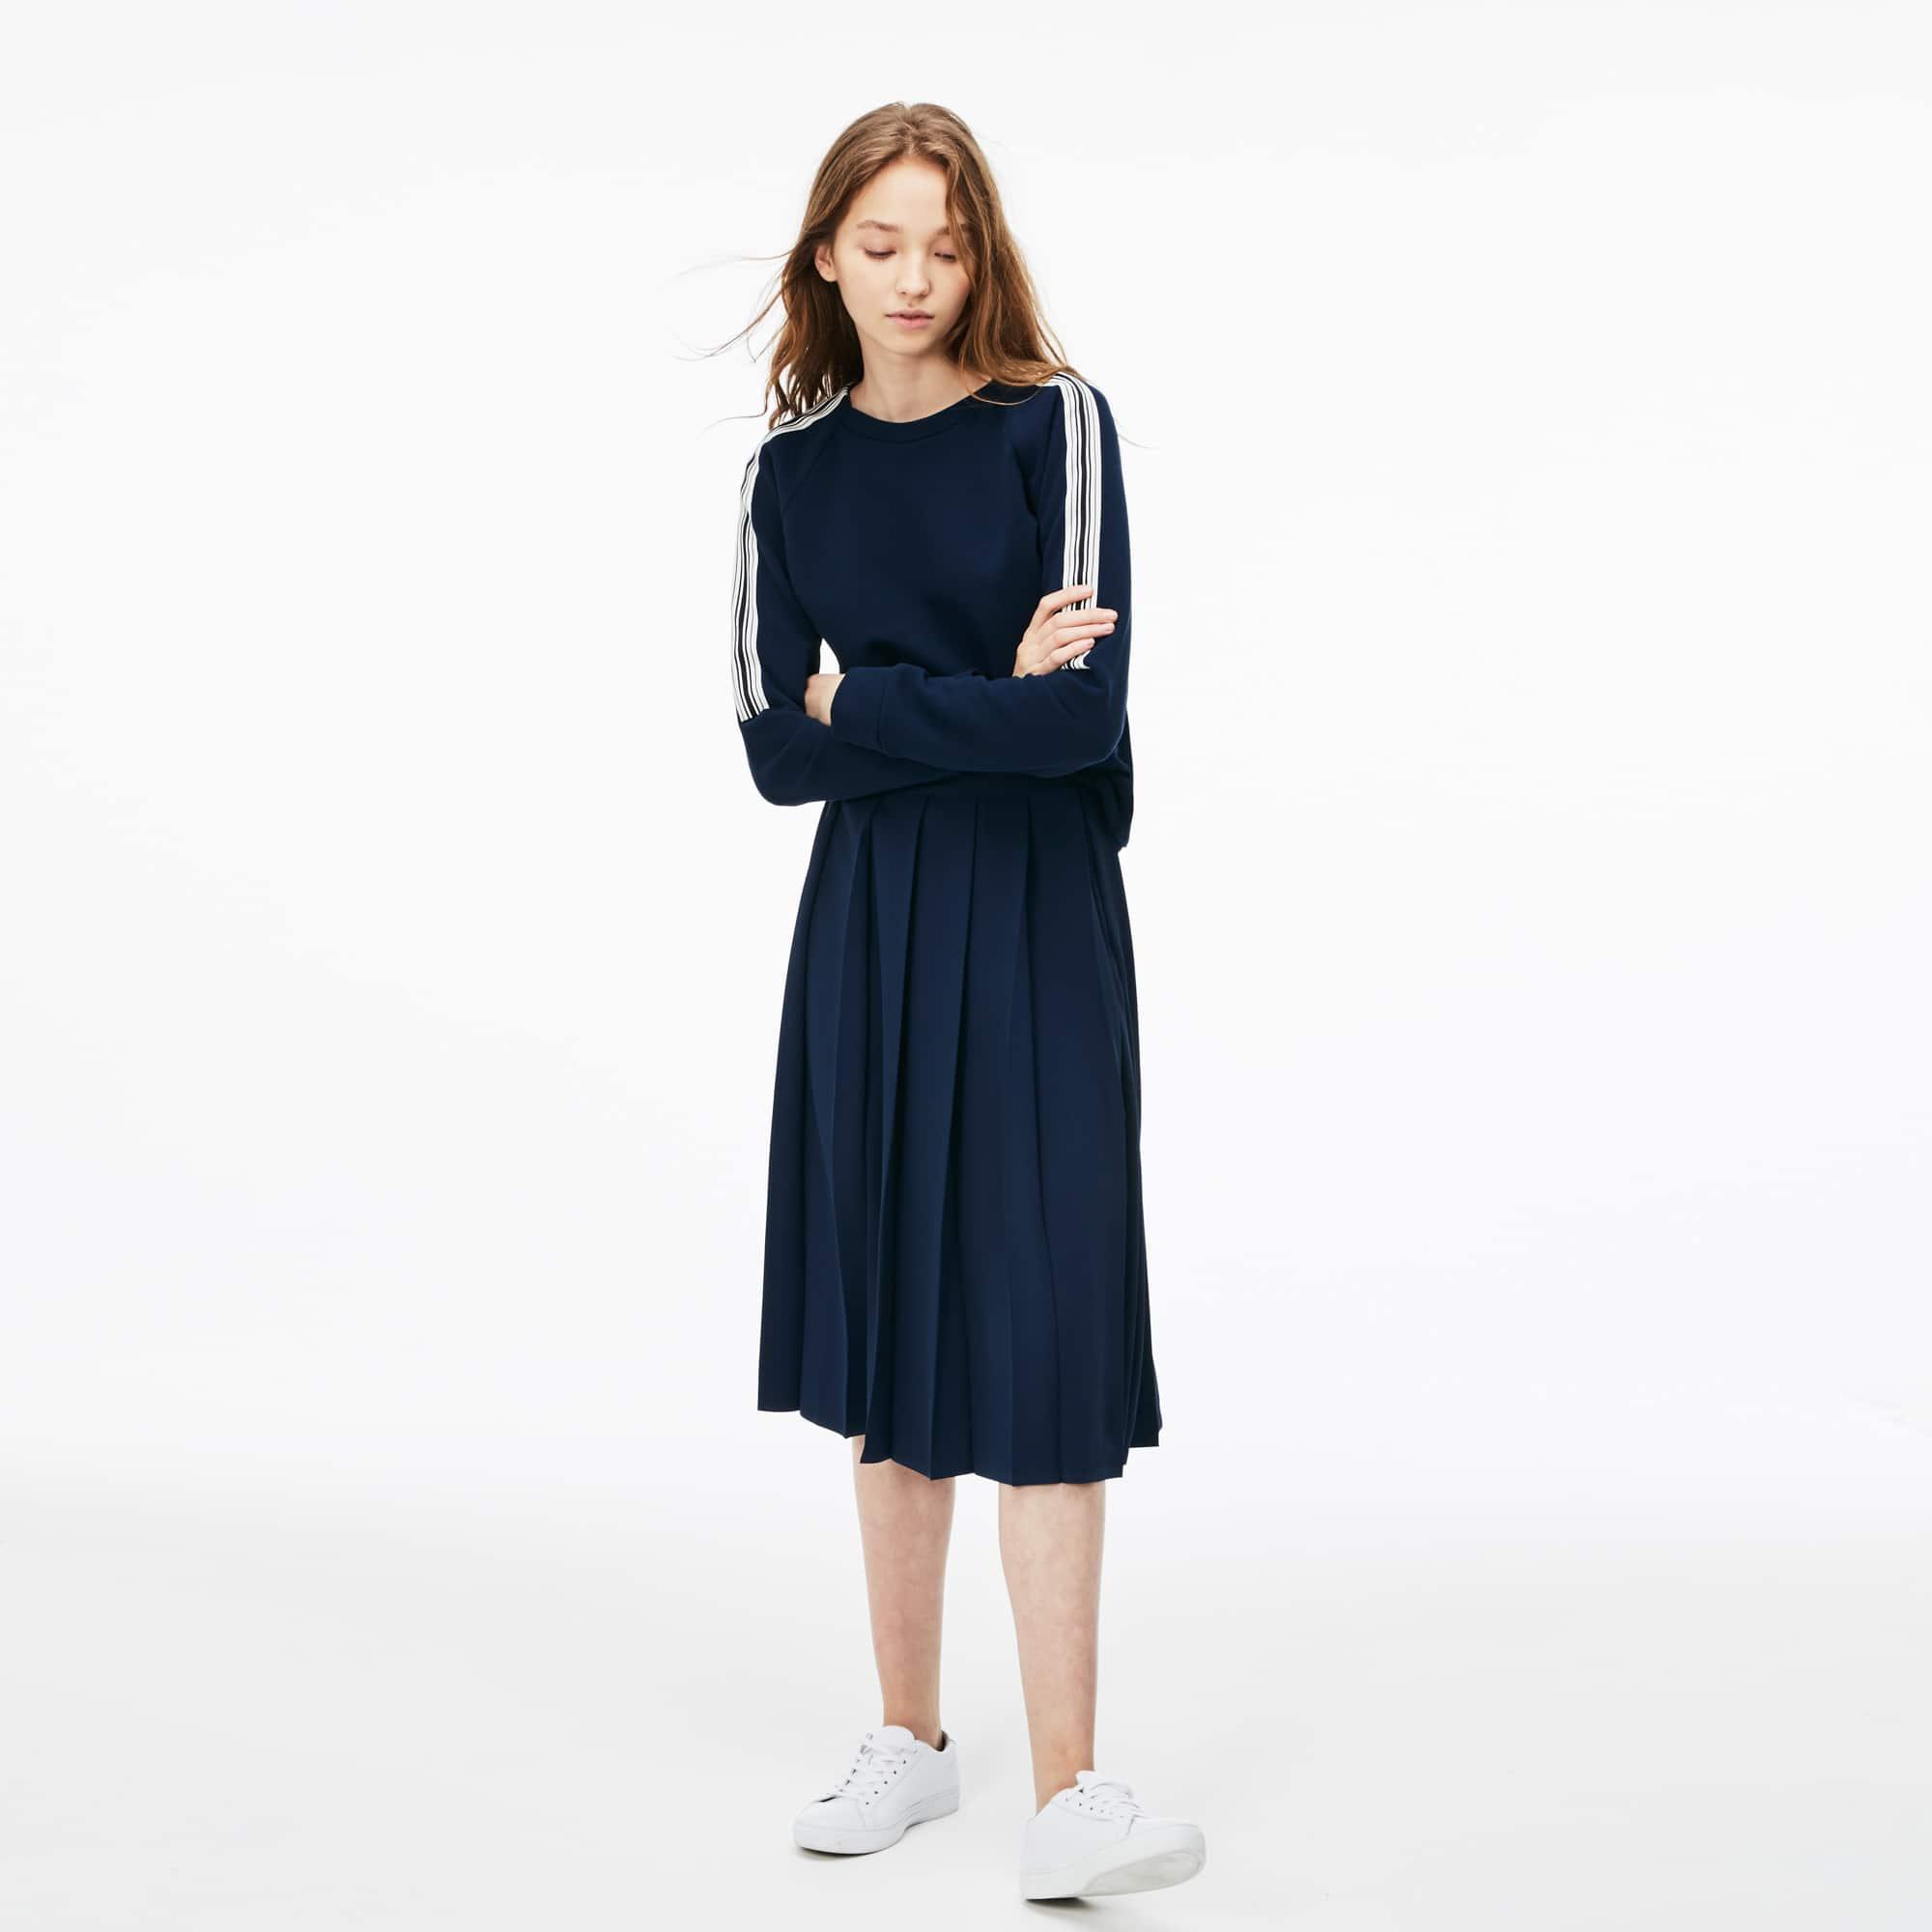 Women's Long Pleated Mousseline Skirt